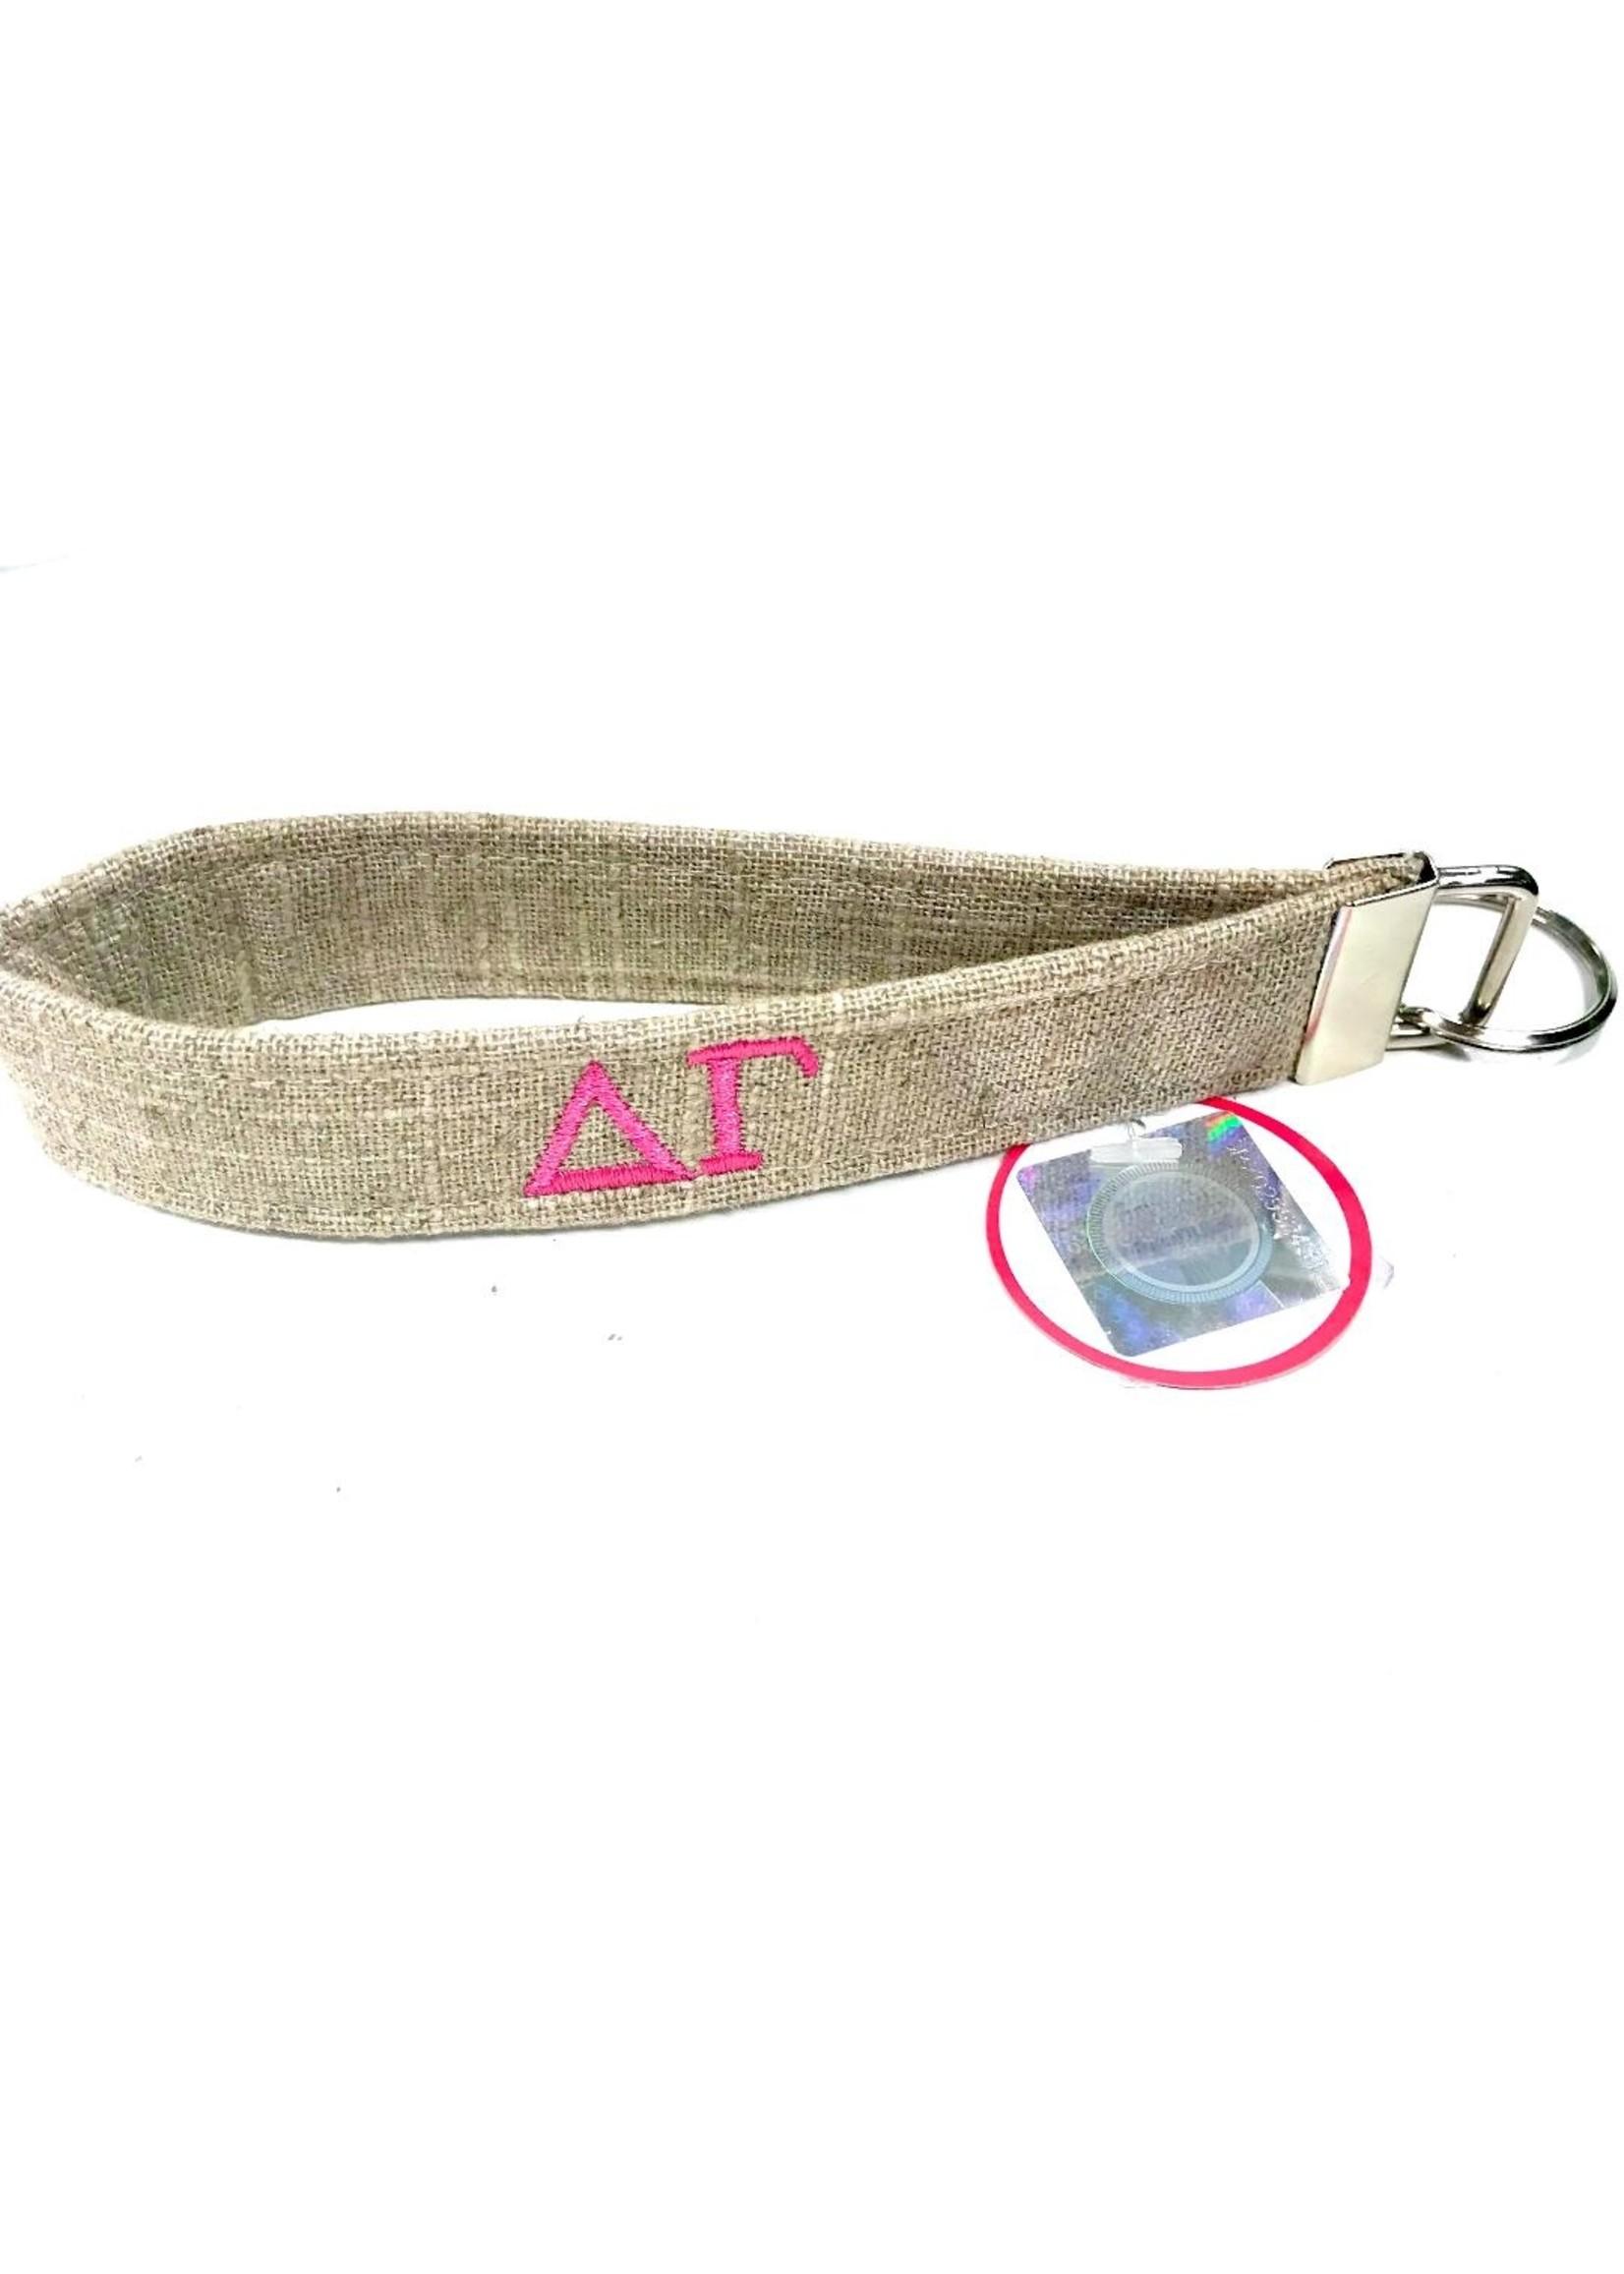 Dog Collar World Delta Gamma Keychain